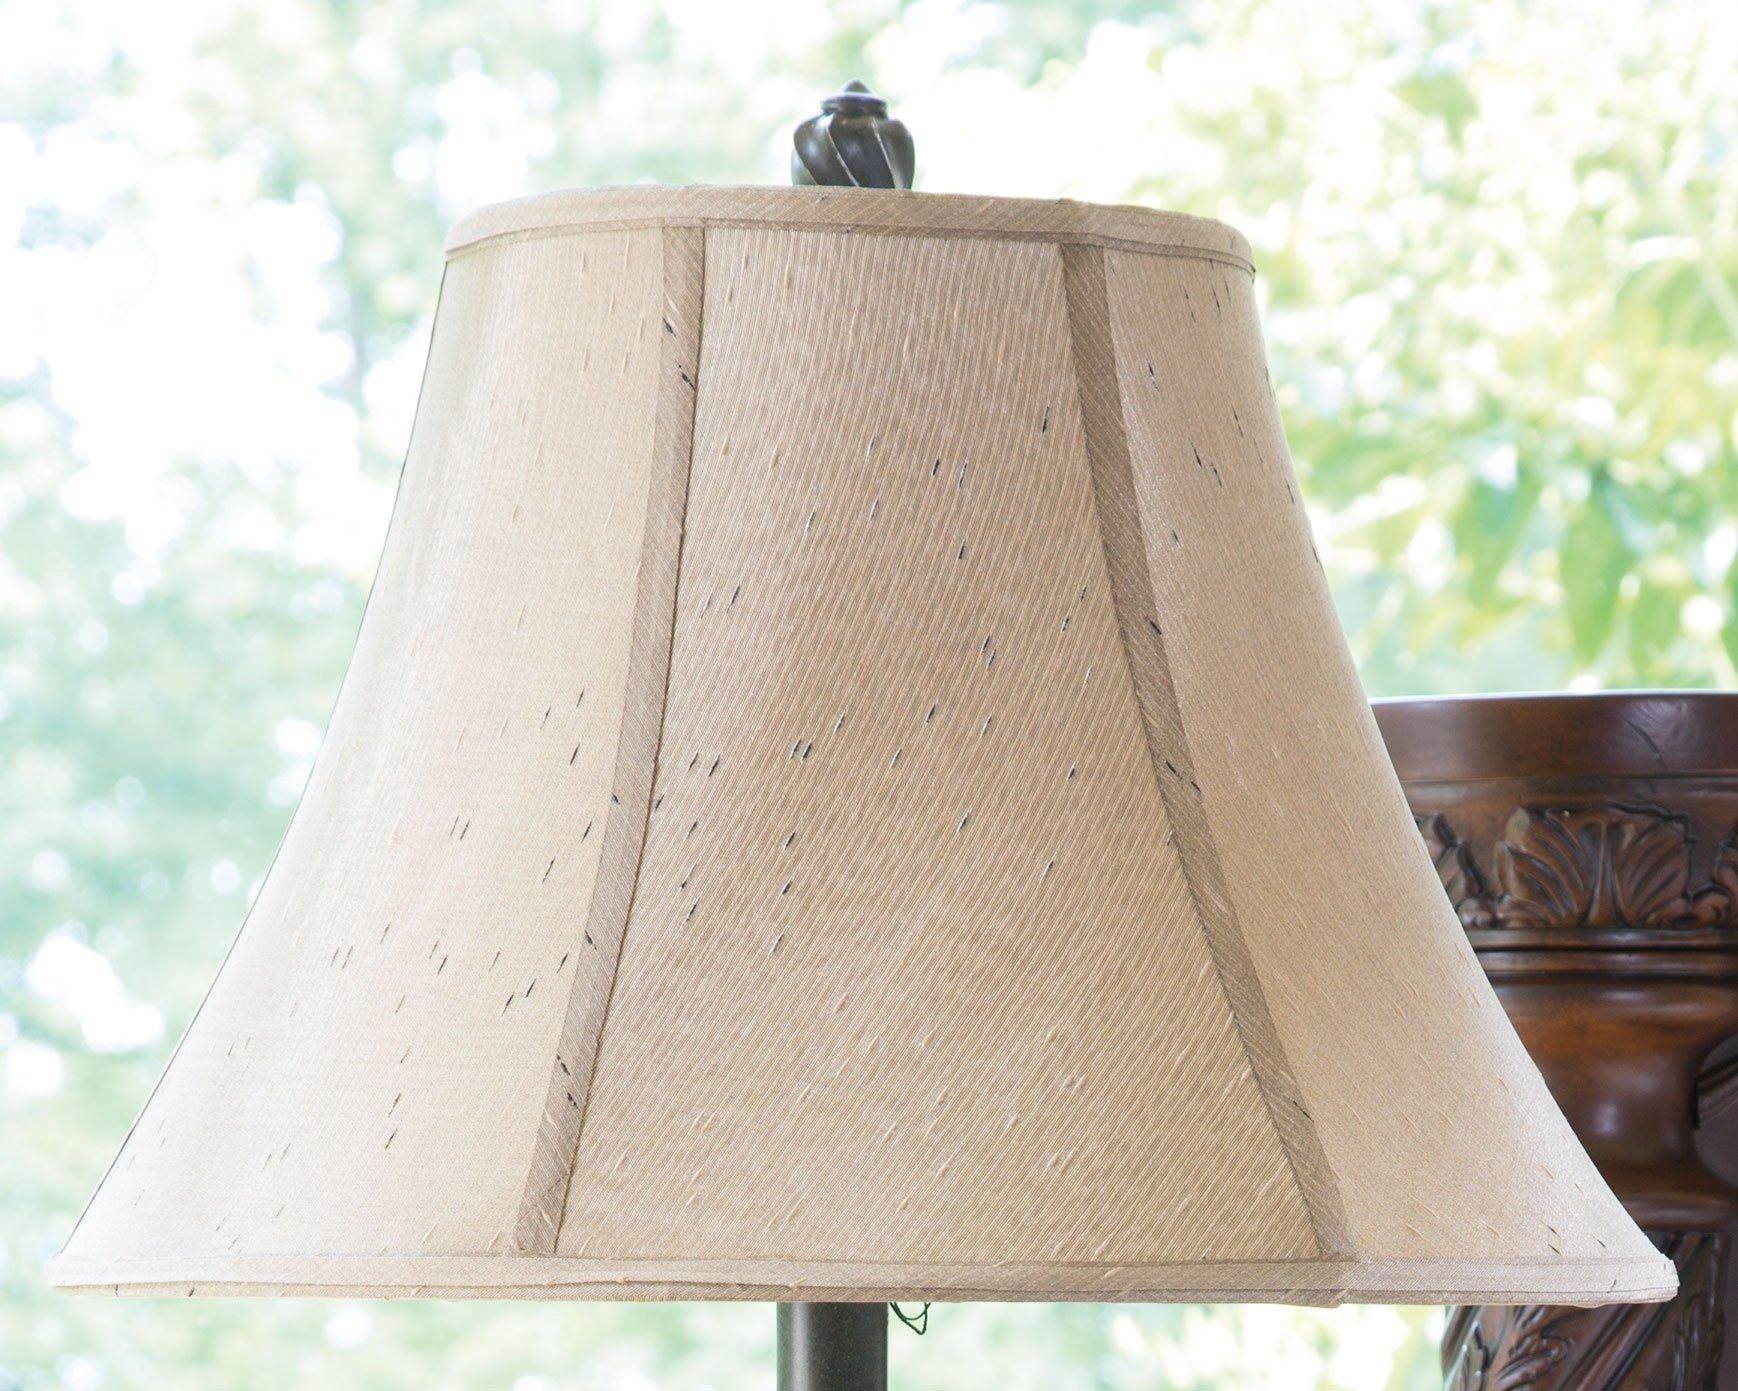 Ashley Furniture Signature Design - Gavivi Table Lamp - Elegant Vintage Style - Softback Bell Shade - Set of 2 by Signature Design by Ashley